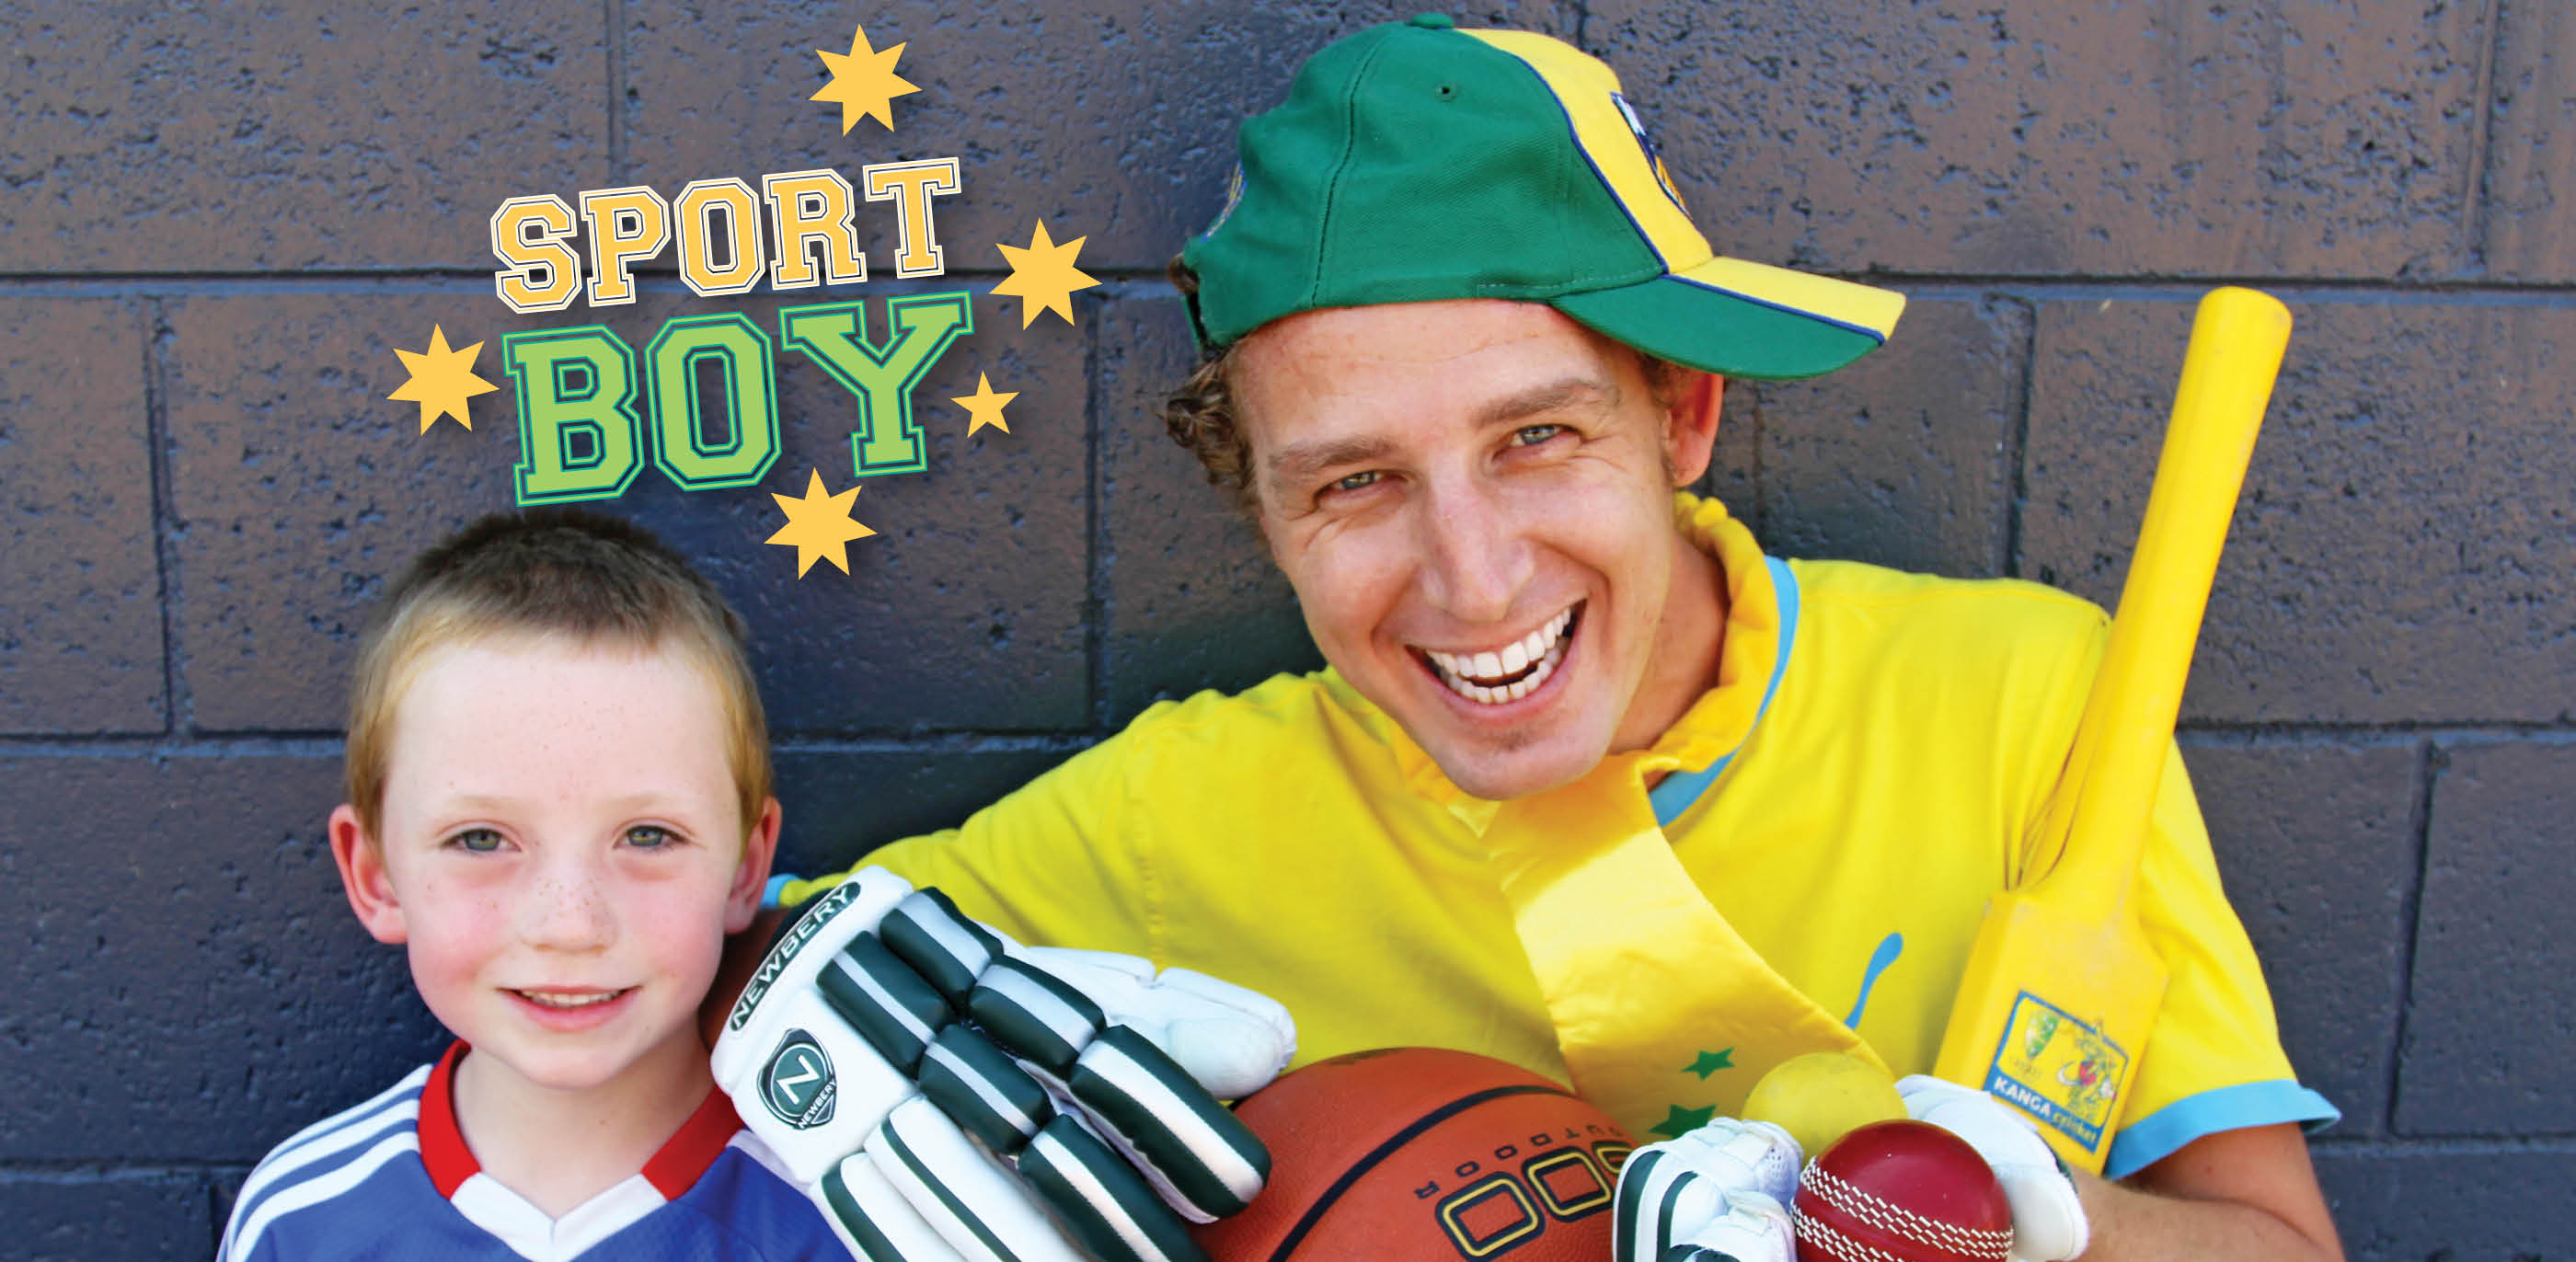 Sportboy party